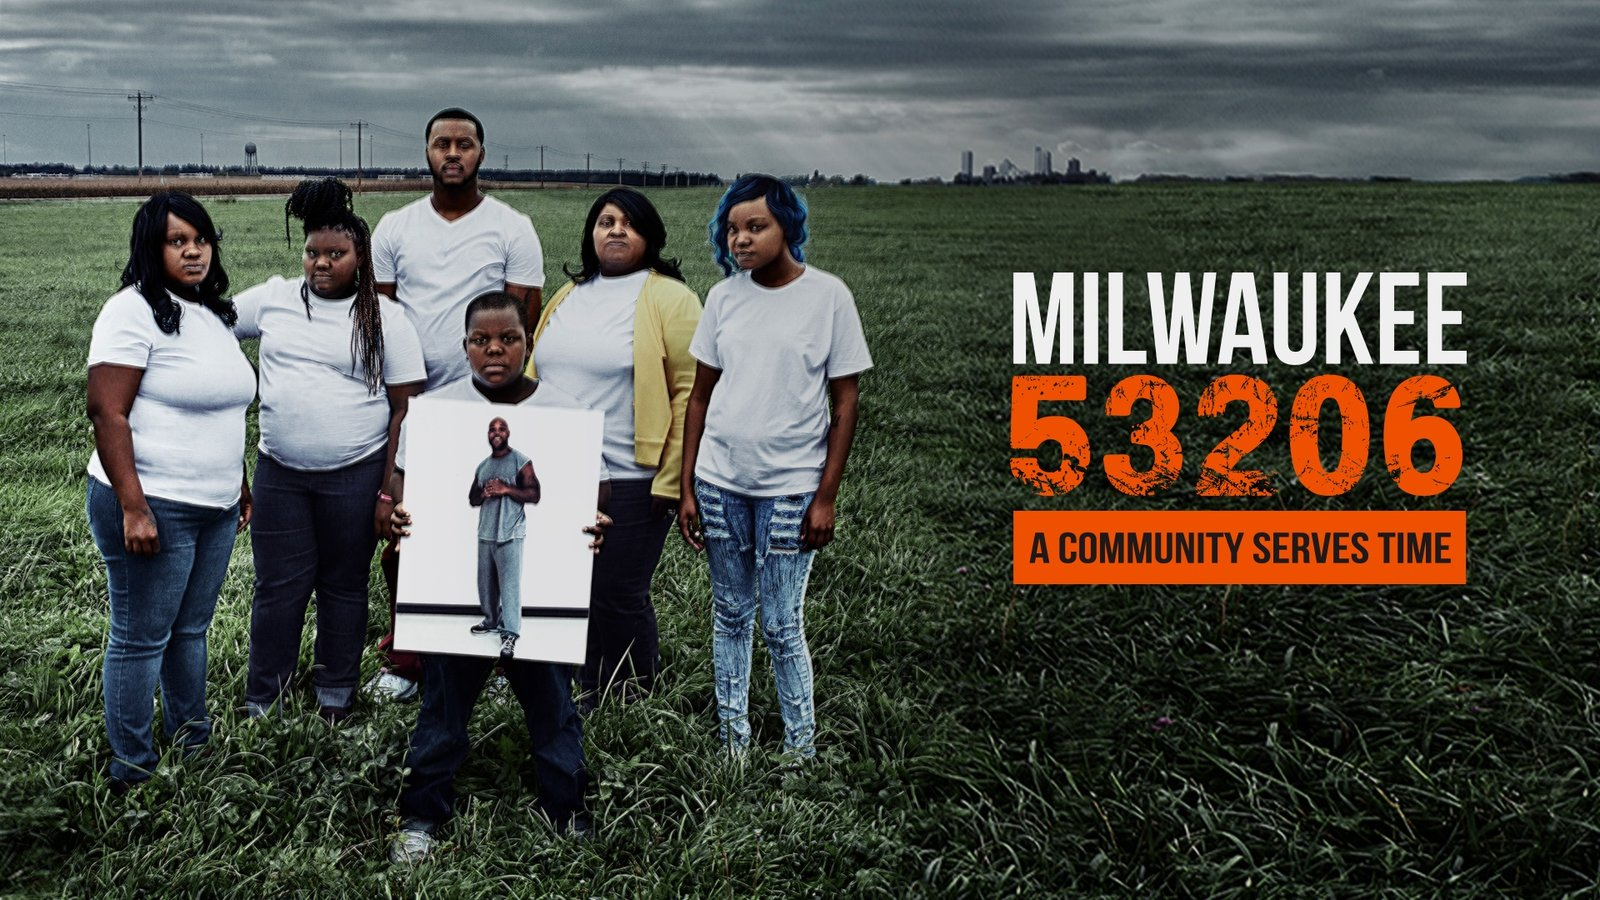 Milwaukee 53206 - America's Mass Incarceration Crisis